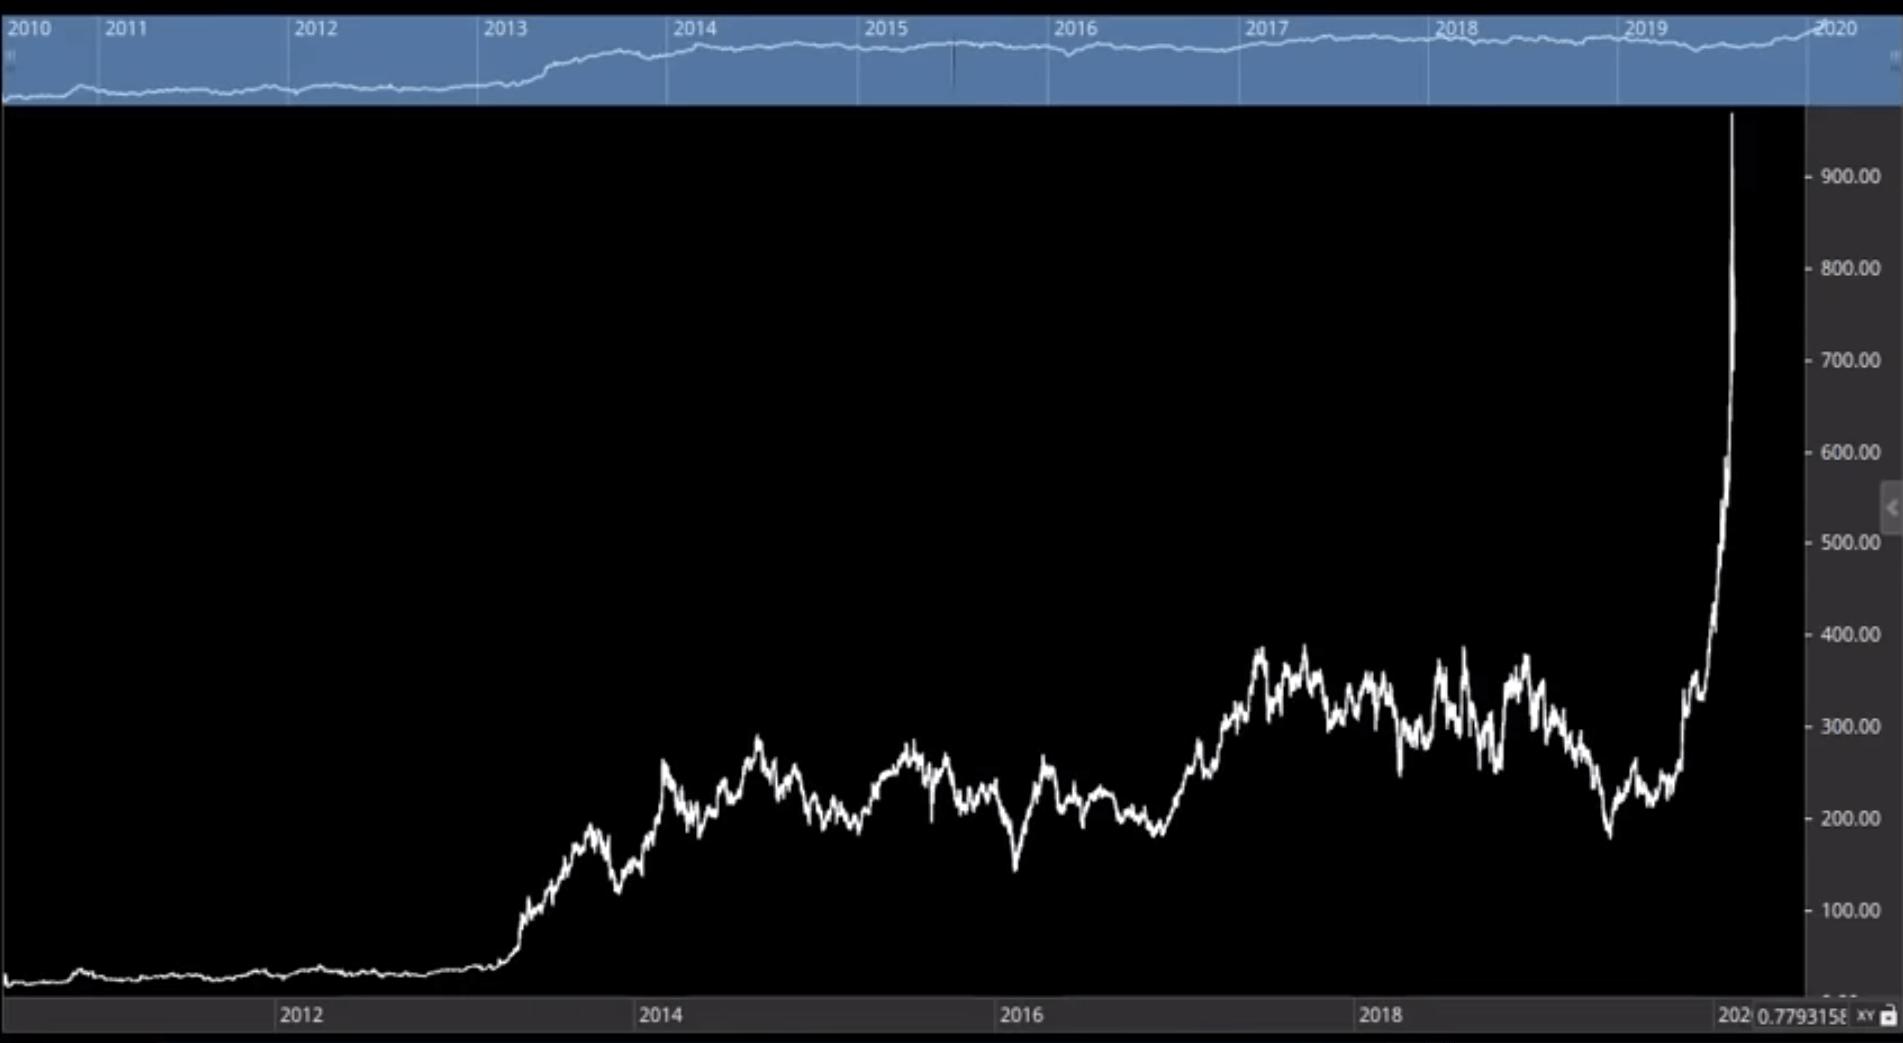 TSLA price chart longterm